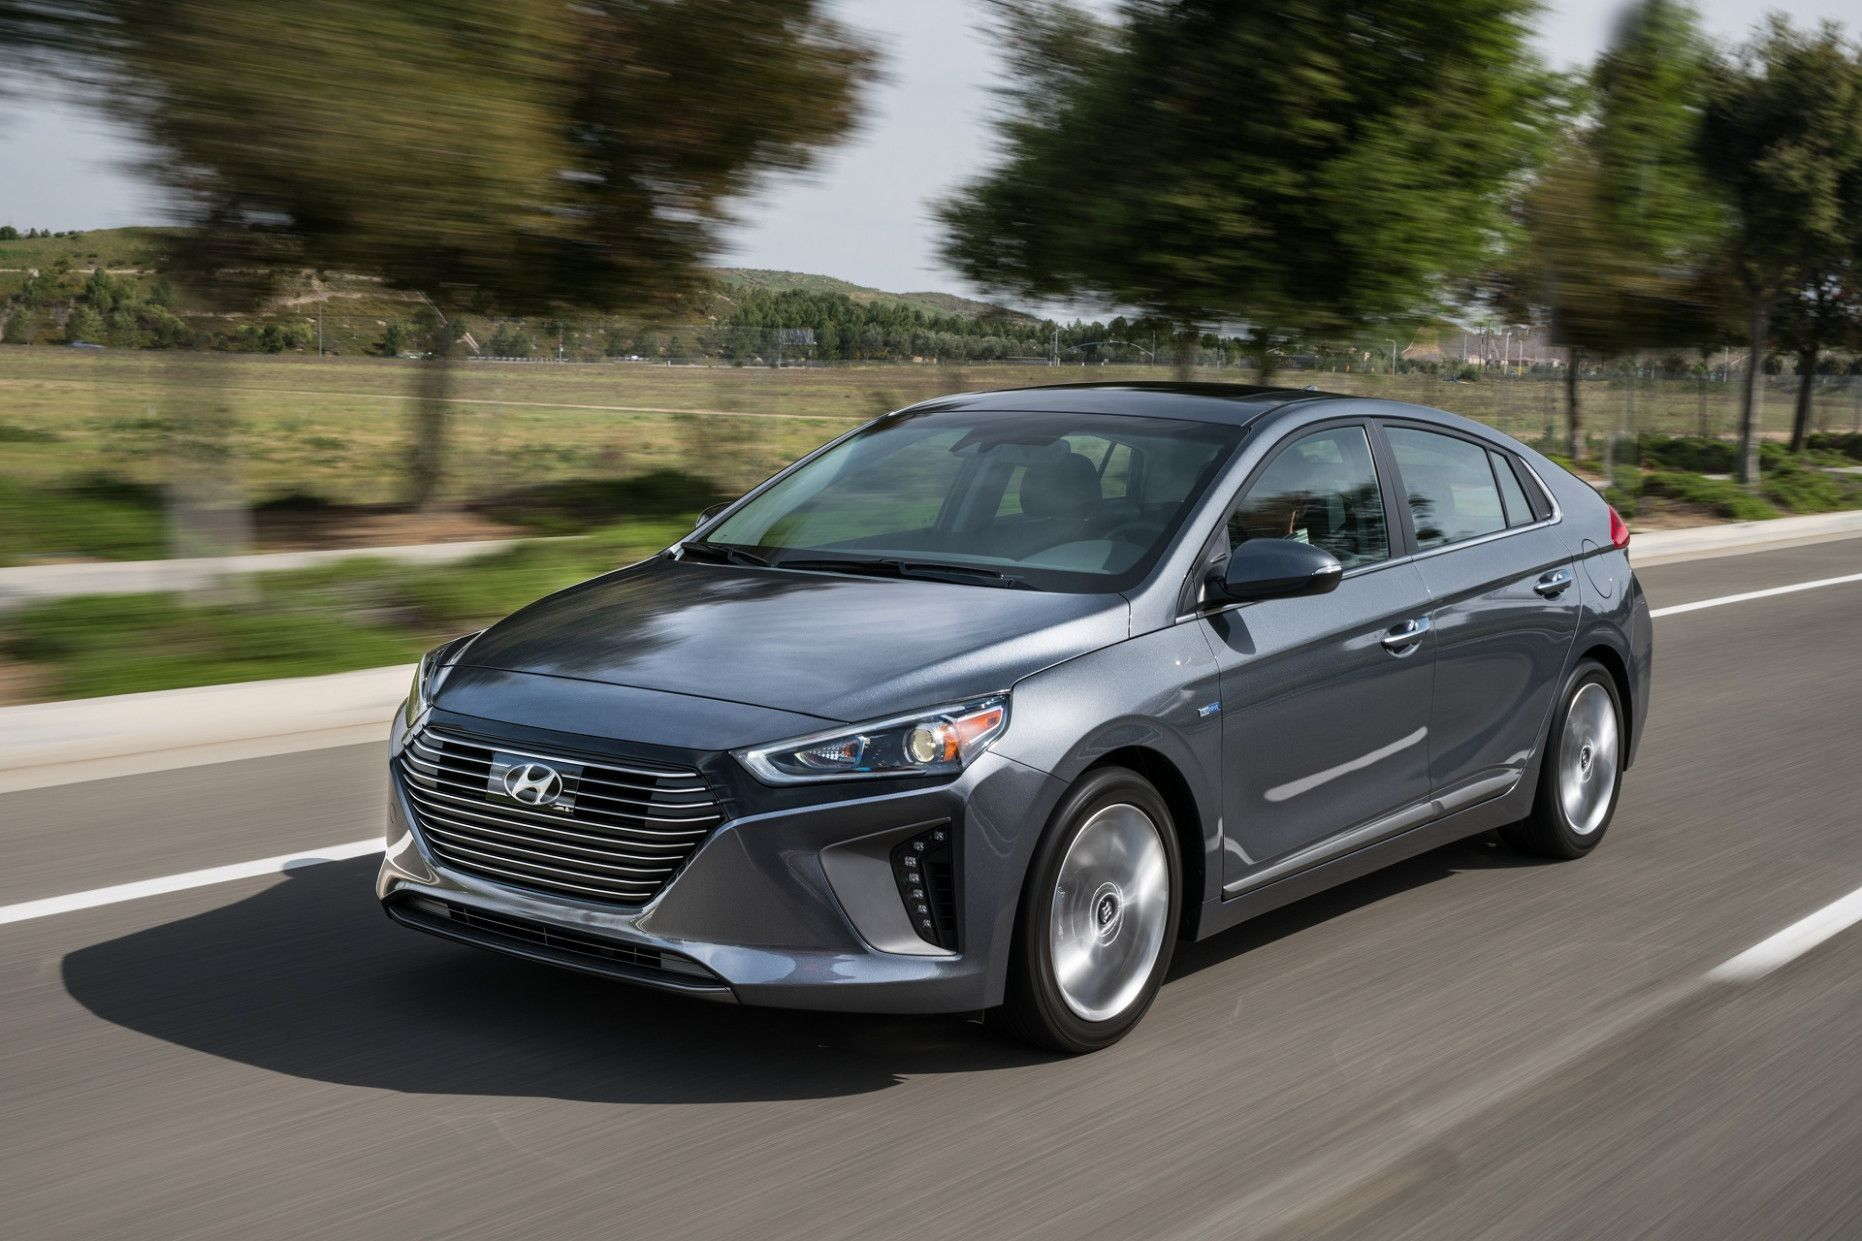 2020 Hyundai Ioniq Hybrid Review Release Date And Concept Gibridnyj Avtomobil Tojota Prius Avtomobil